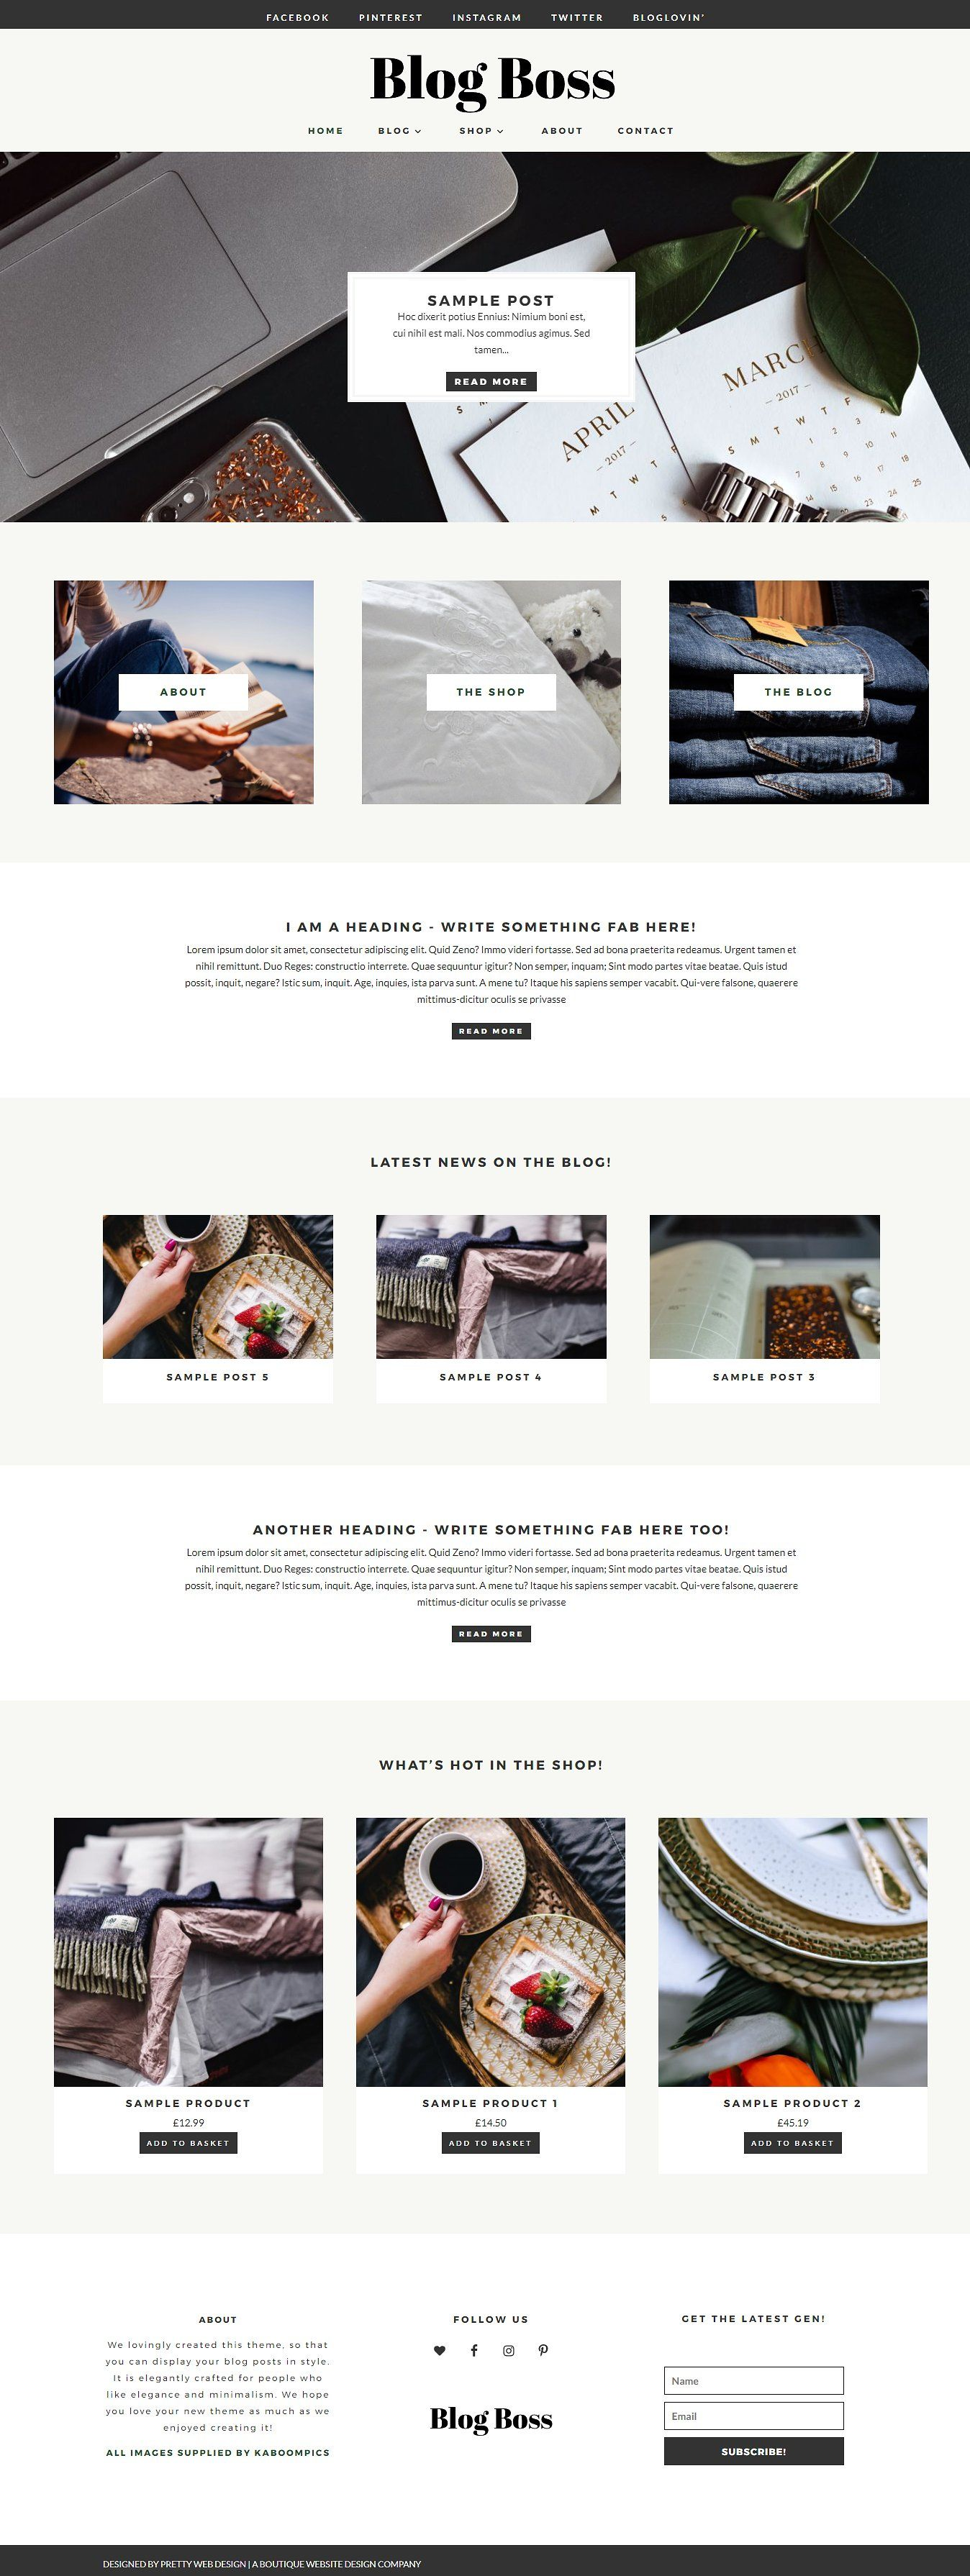 Blog Boss – WordPress Blog Theme by Pretty Web Design on